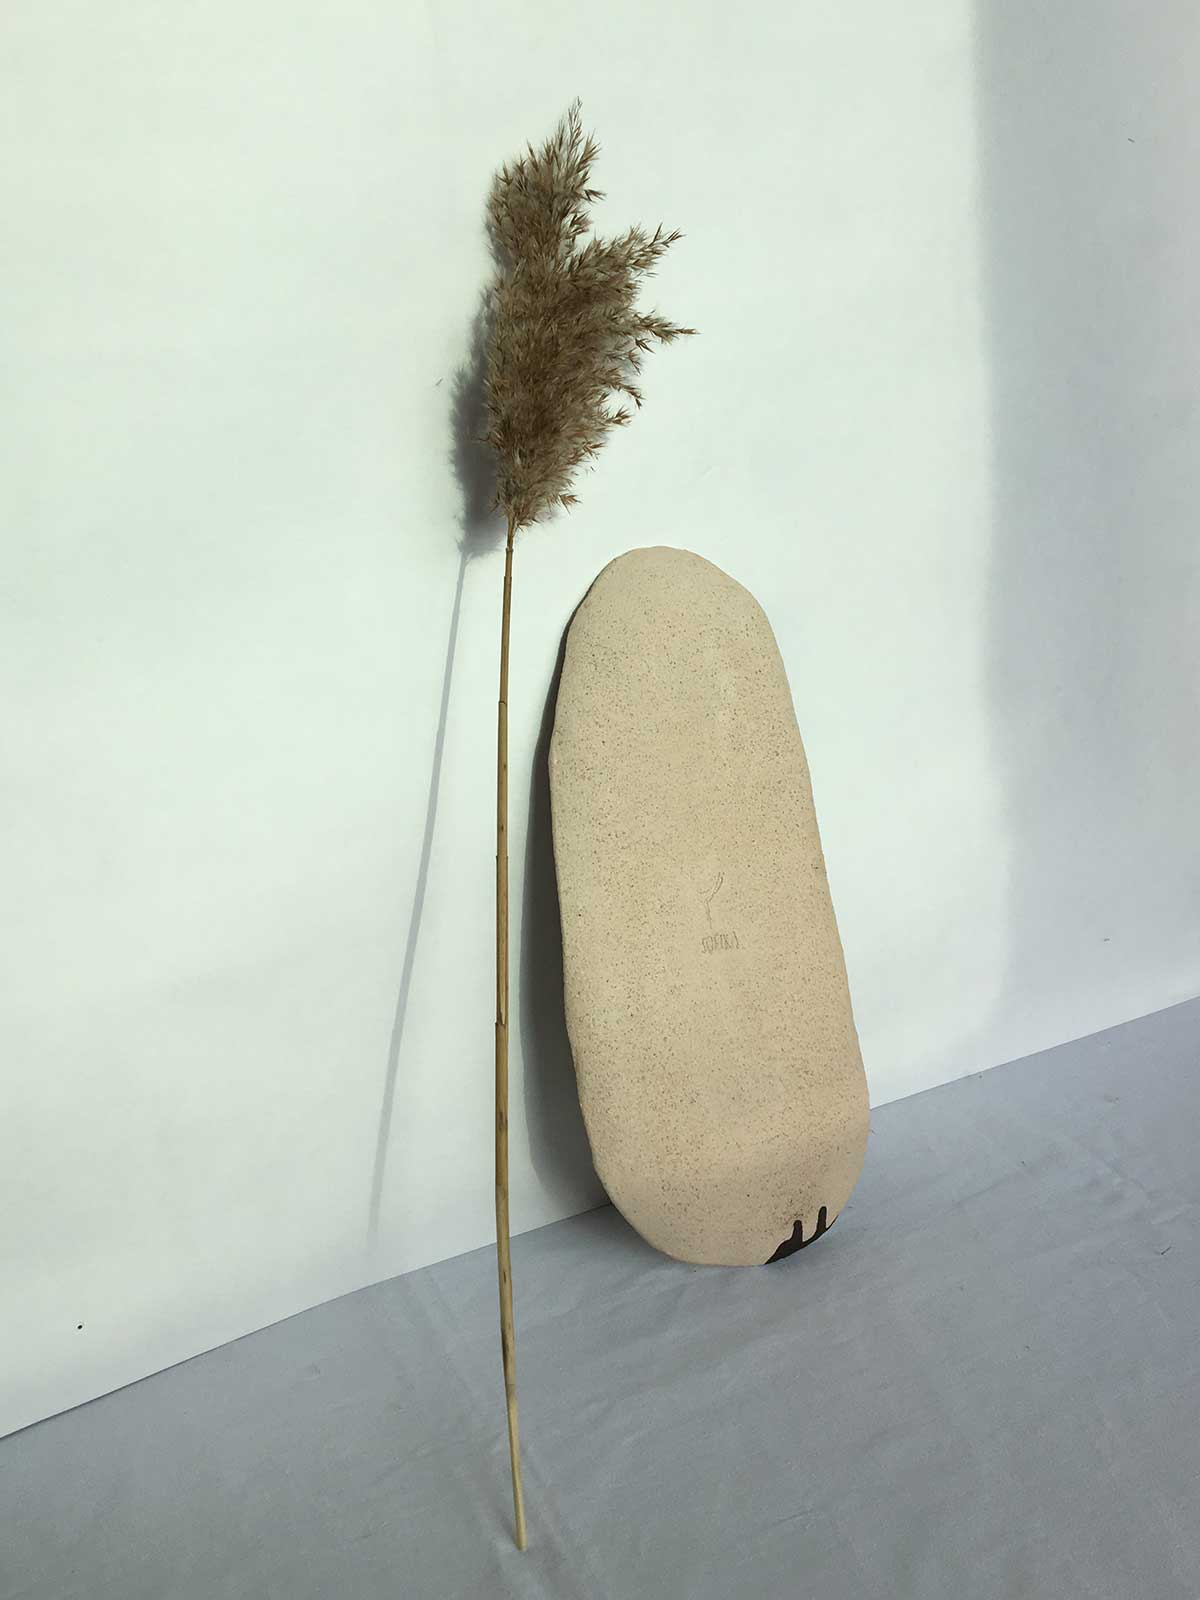 Rear view - Big oval plate (Handmade)